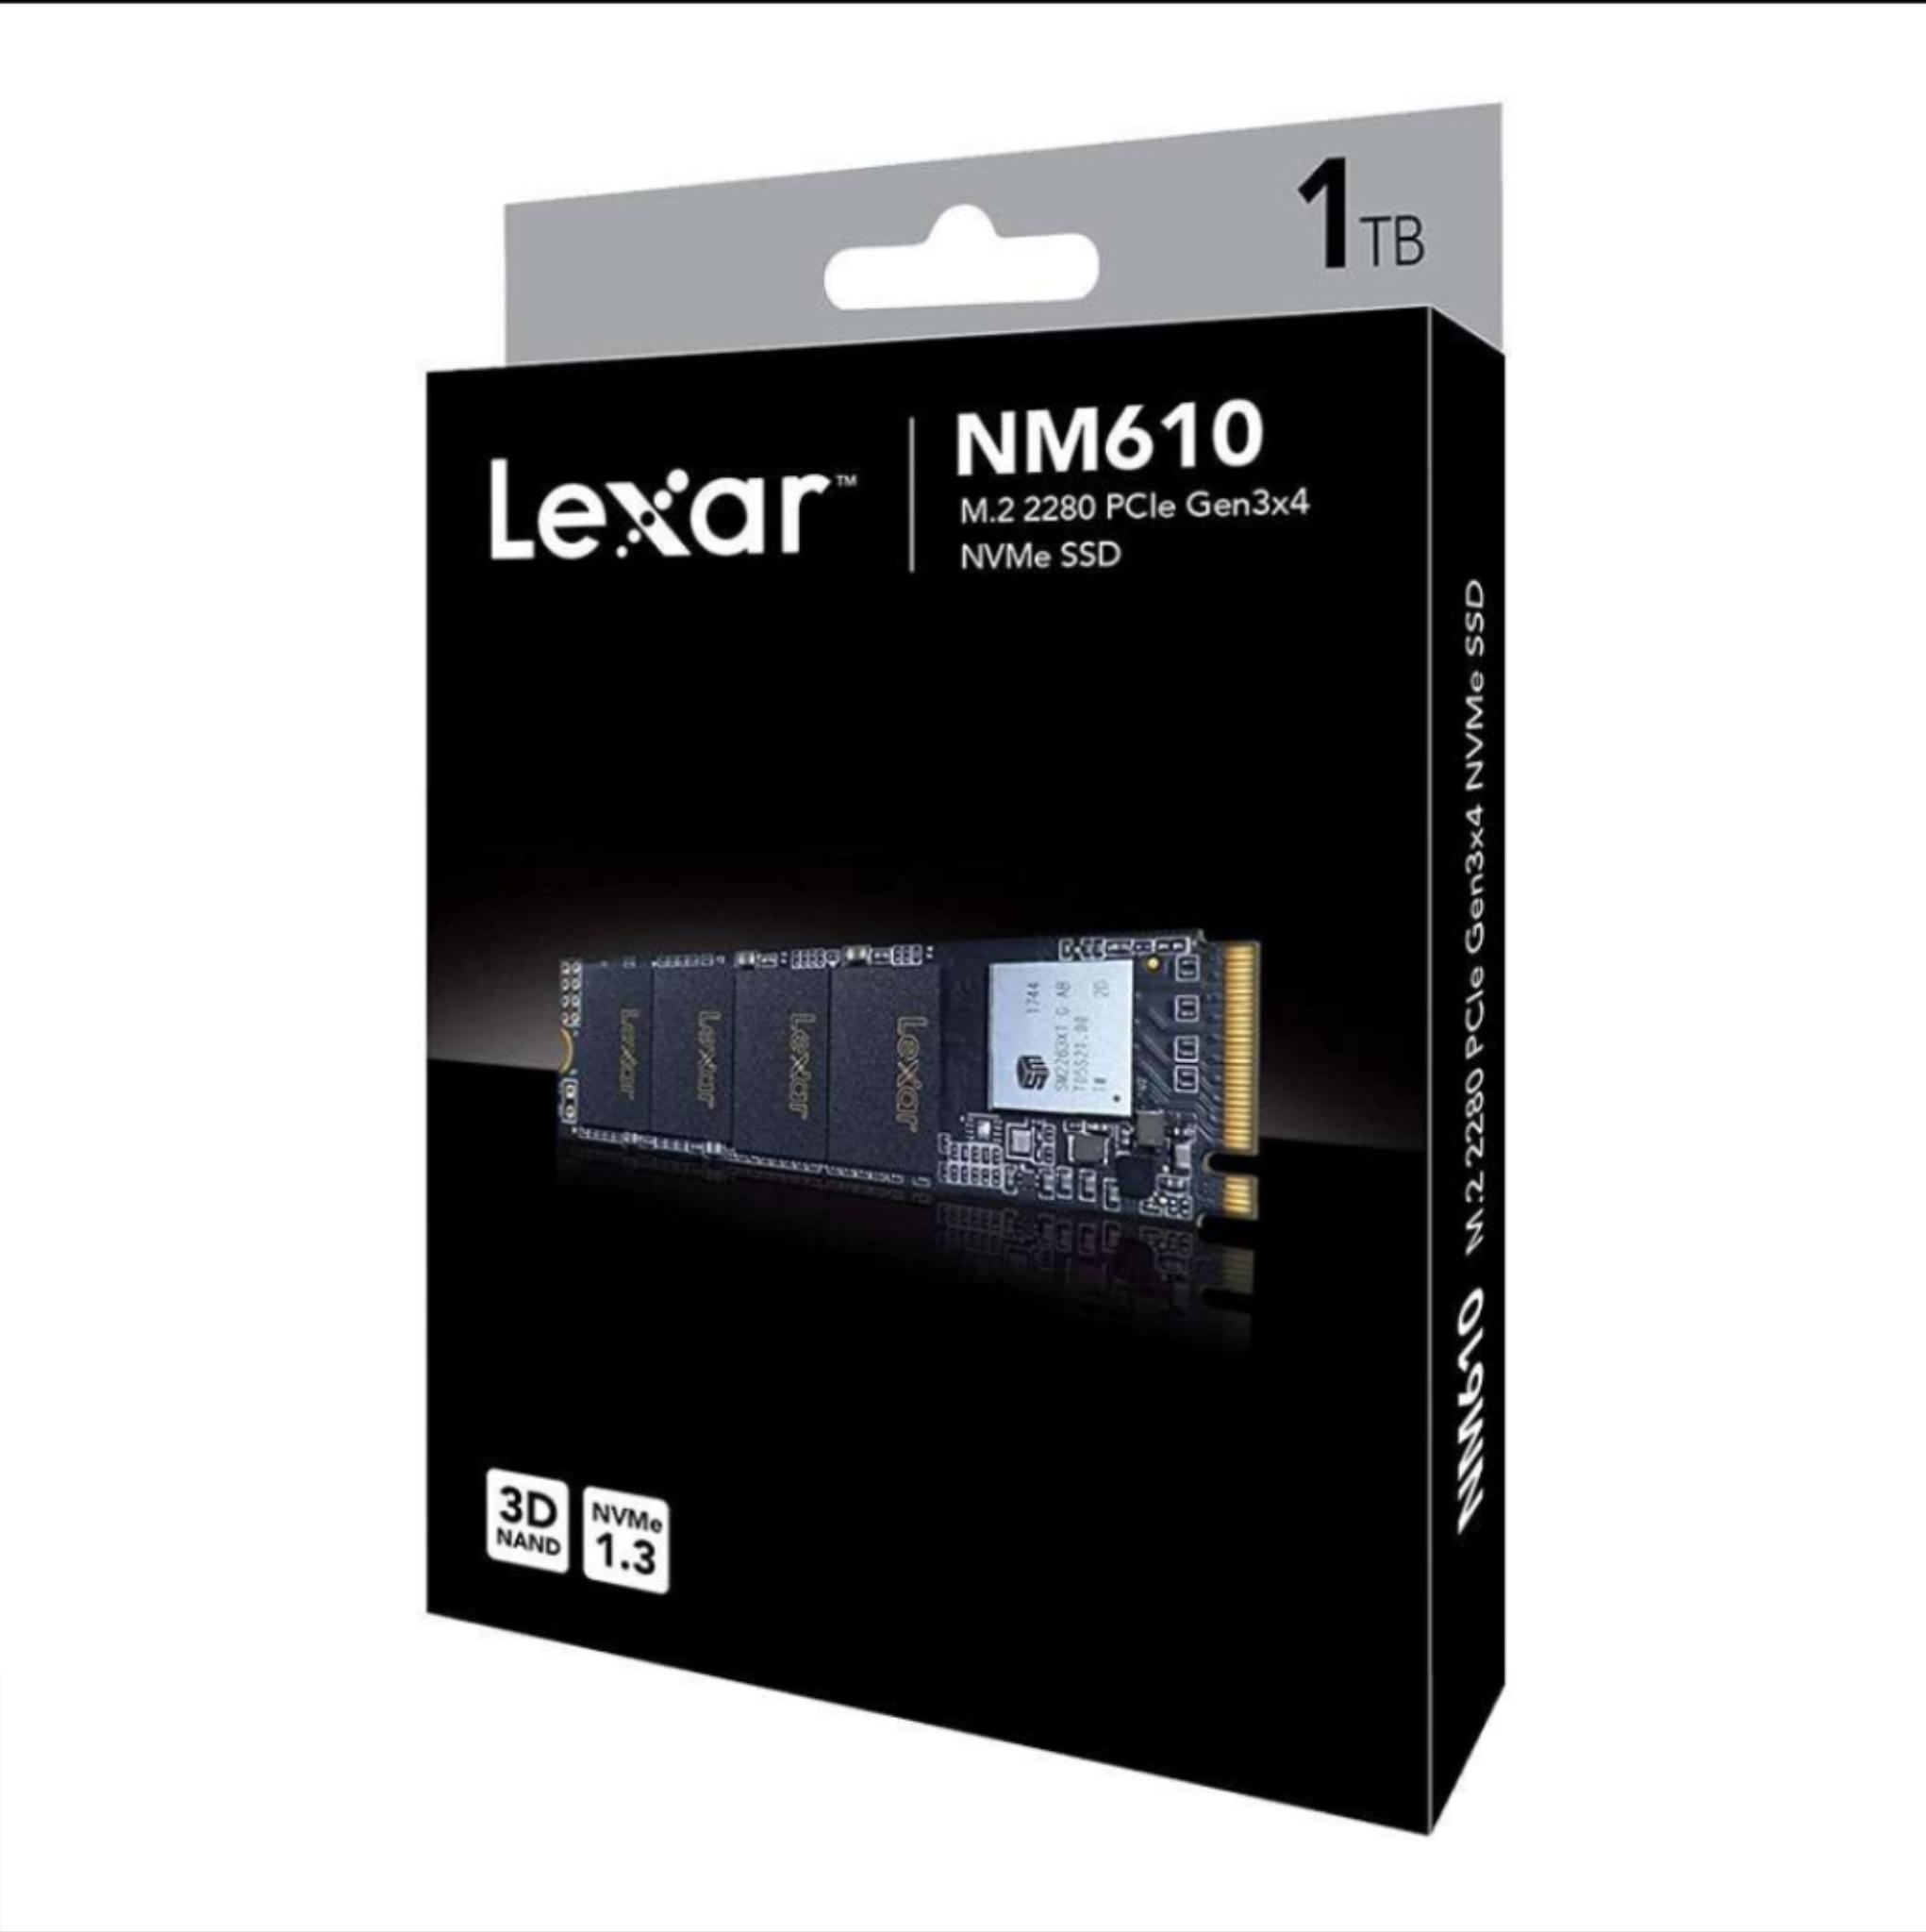 Lexar NM610 1TB M2 2280 NVMe 3D SSD/Solid State Drive £104.99 @ 7dayshop